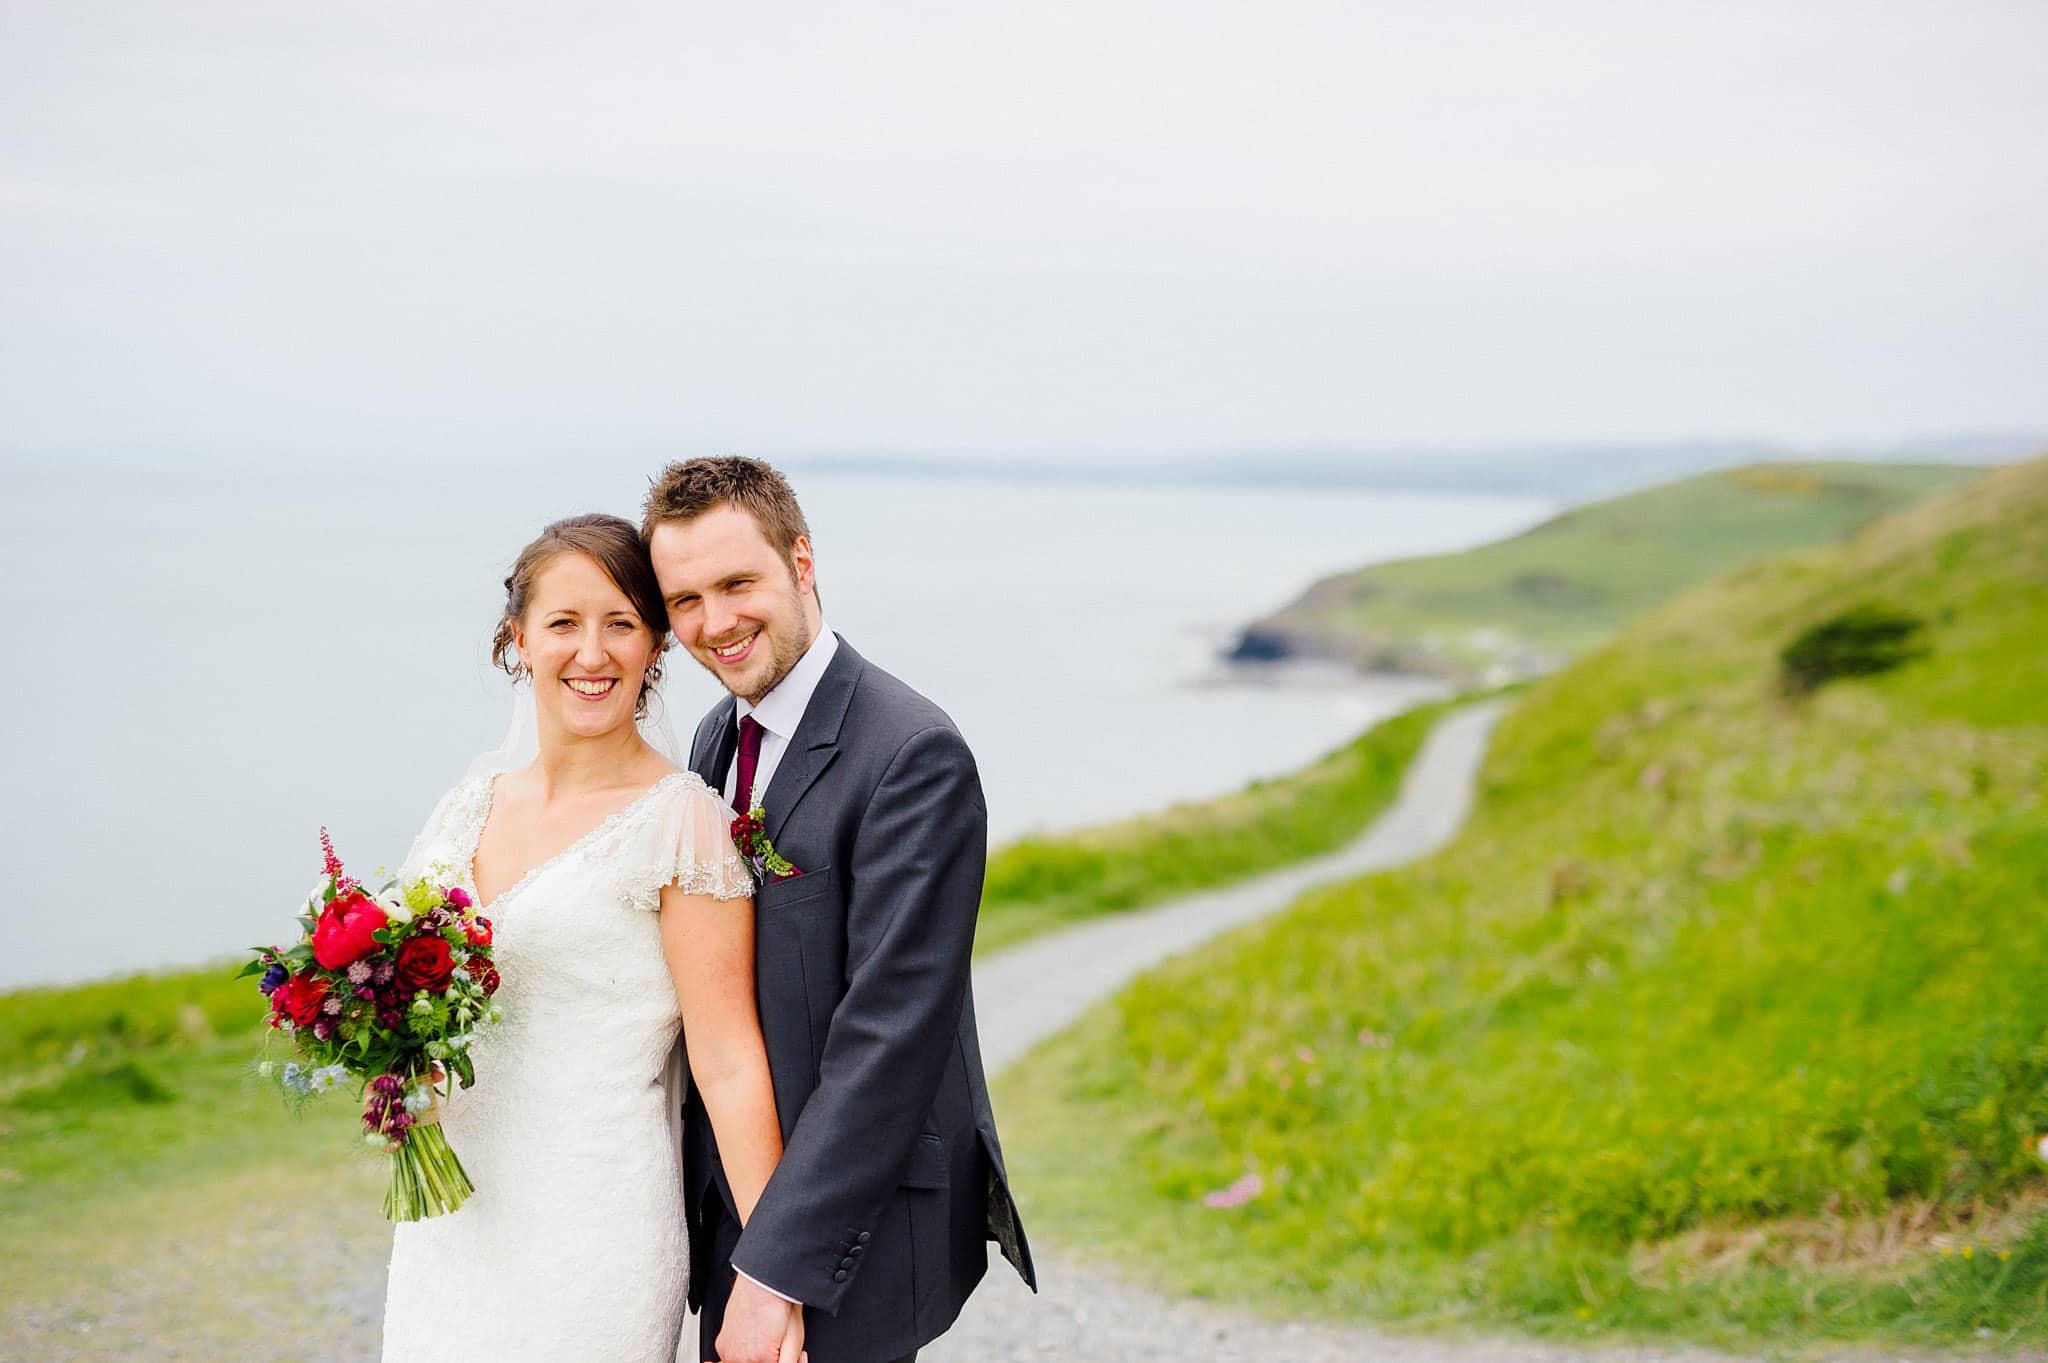 wedding-photographer-aberystwyth-wales (177)